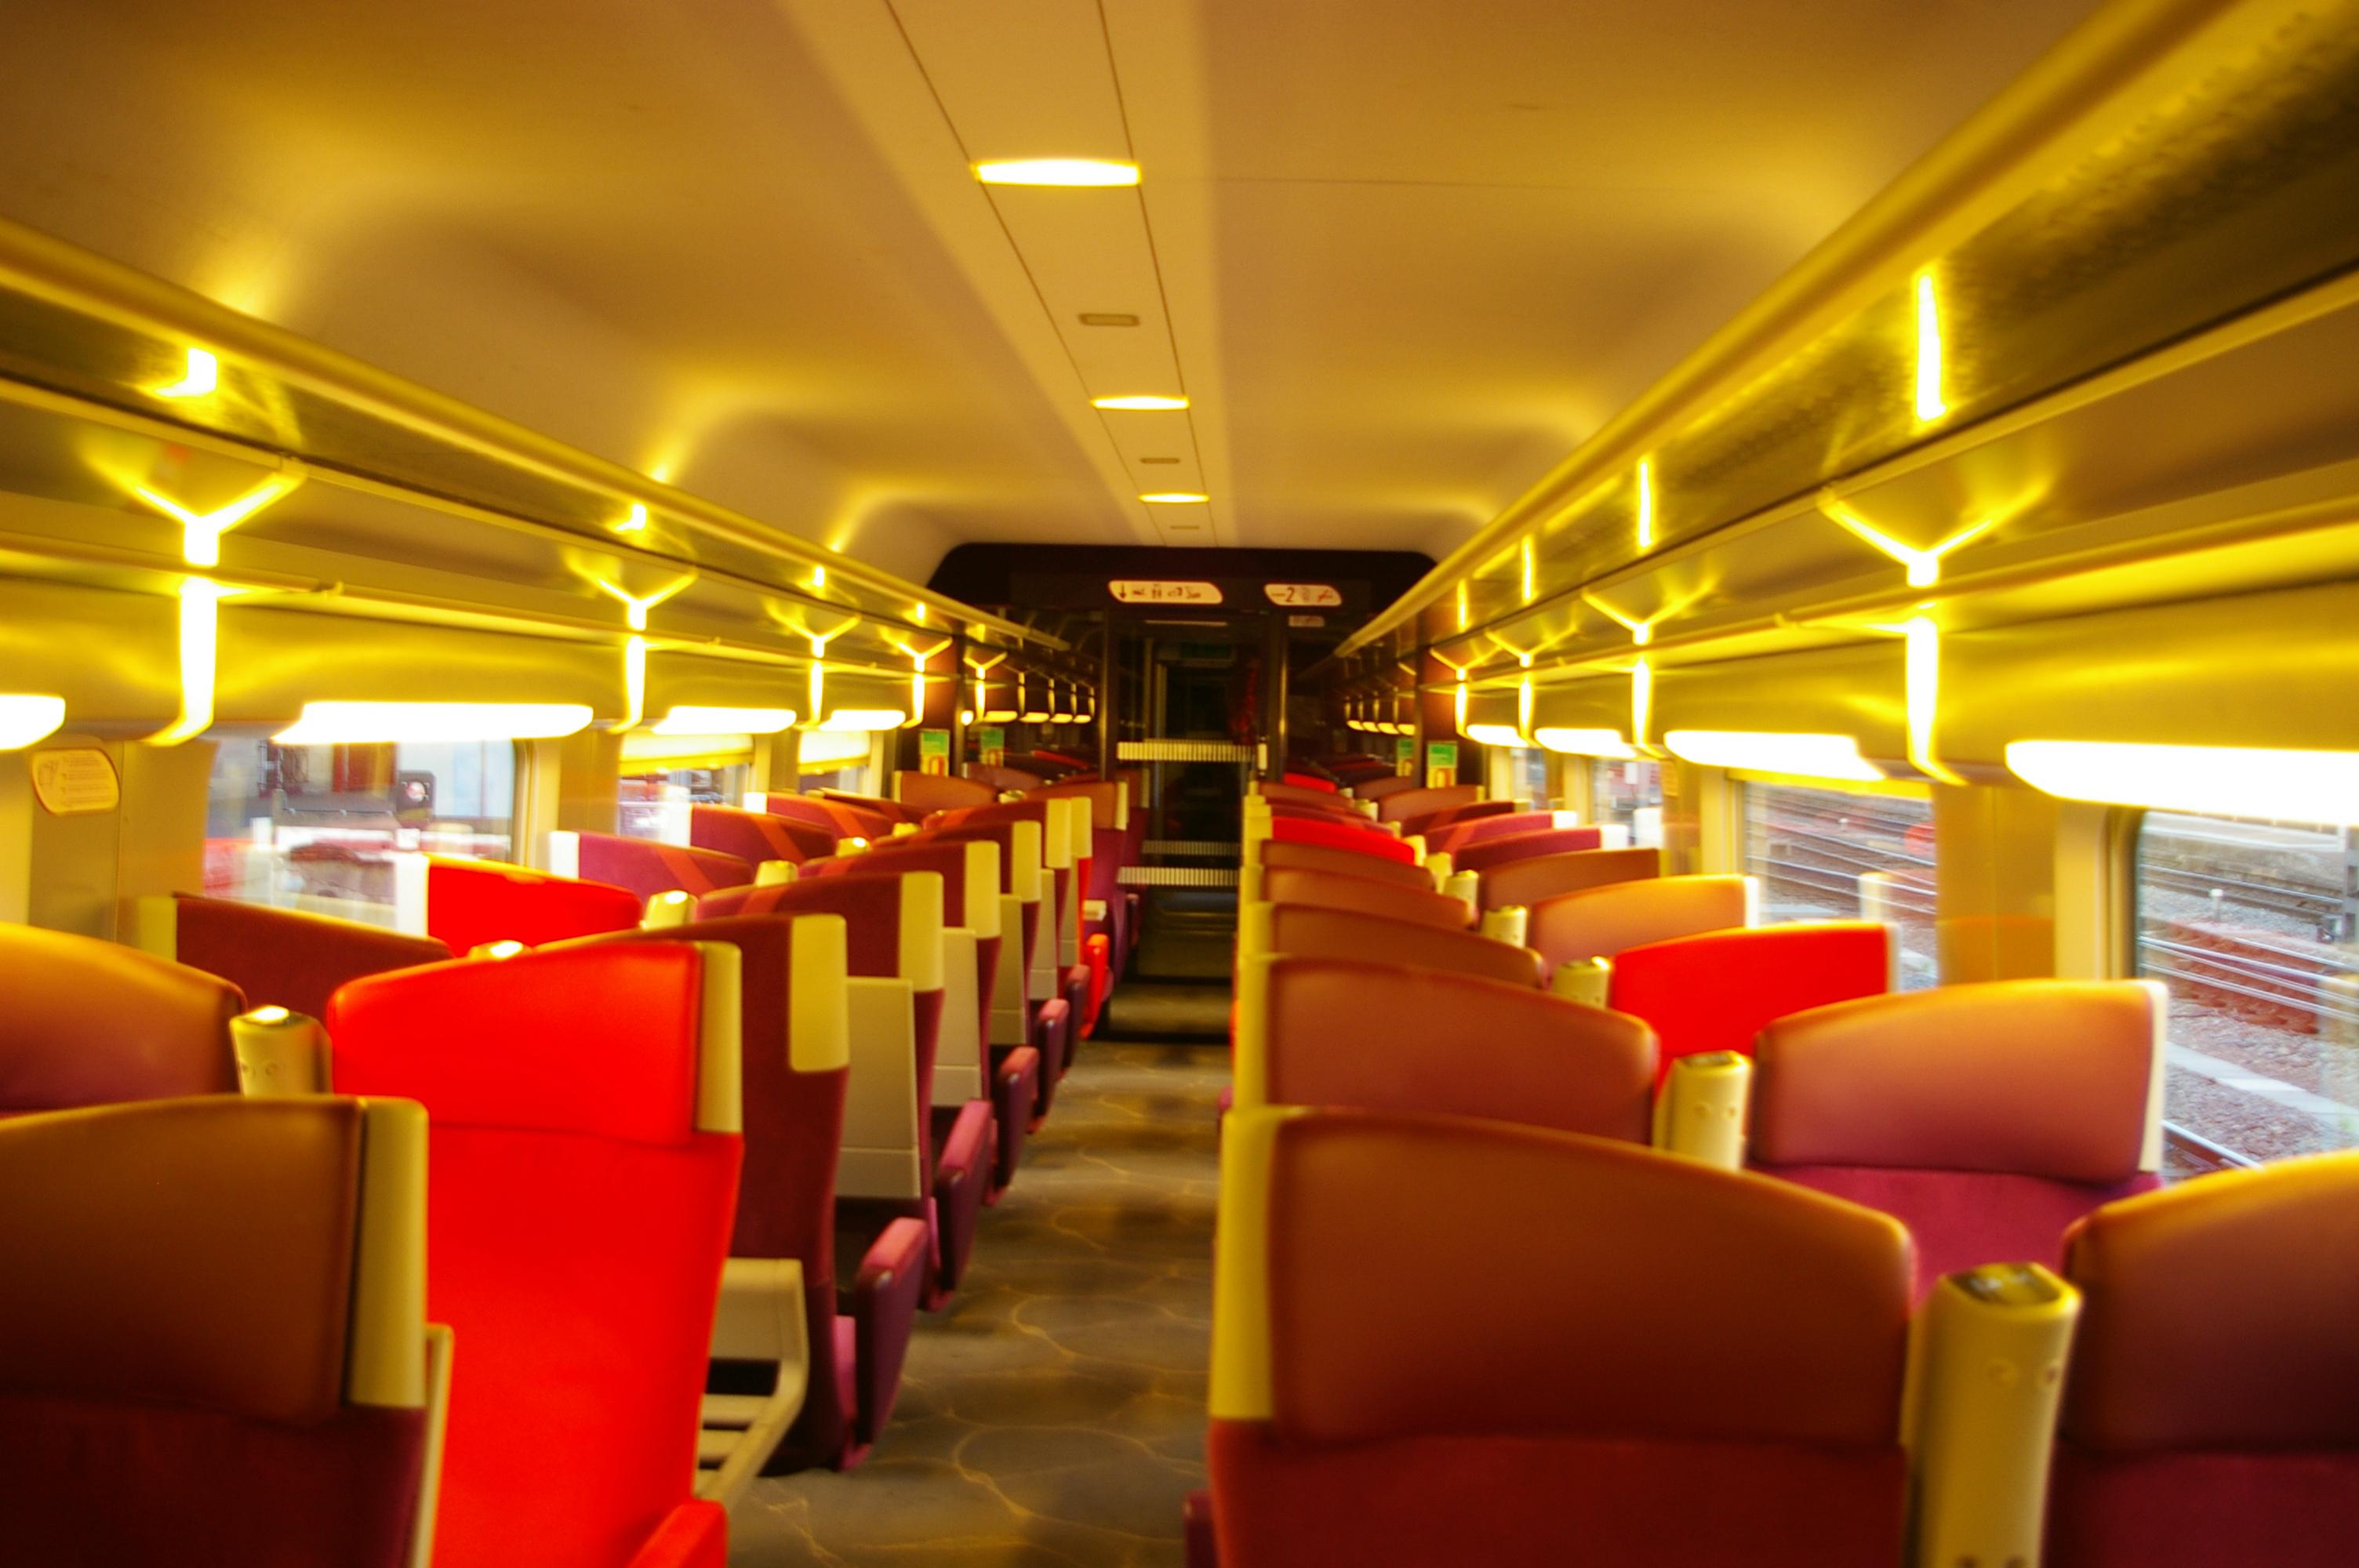 Interior TGV, Empty, Interior, Lights, Red, HQ Photo